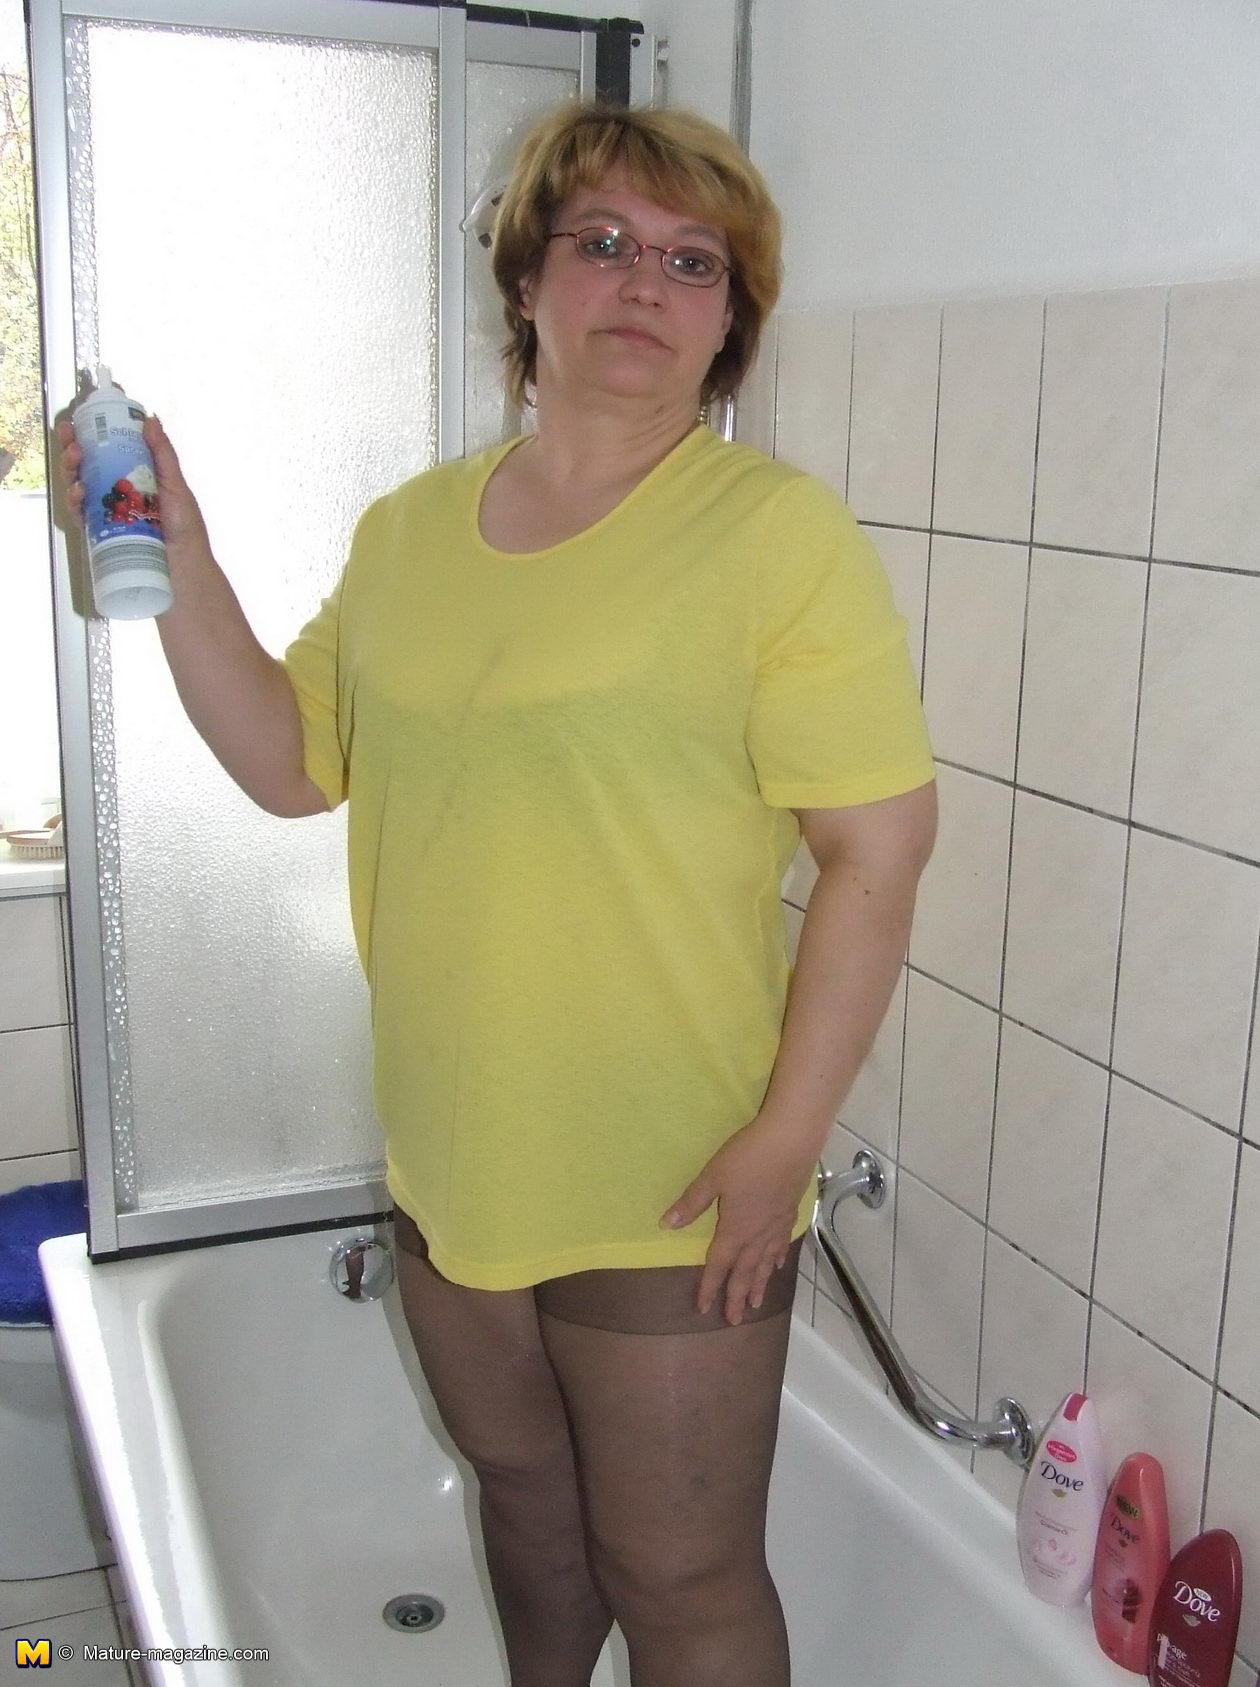 chubby mature slut playing in her bathtub - grannypornpics